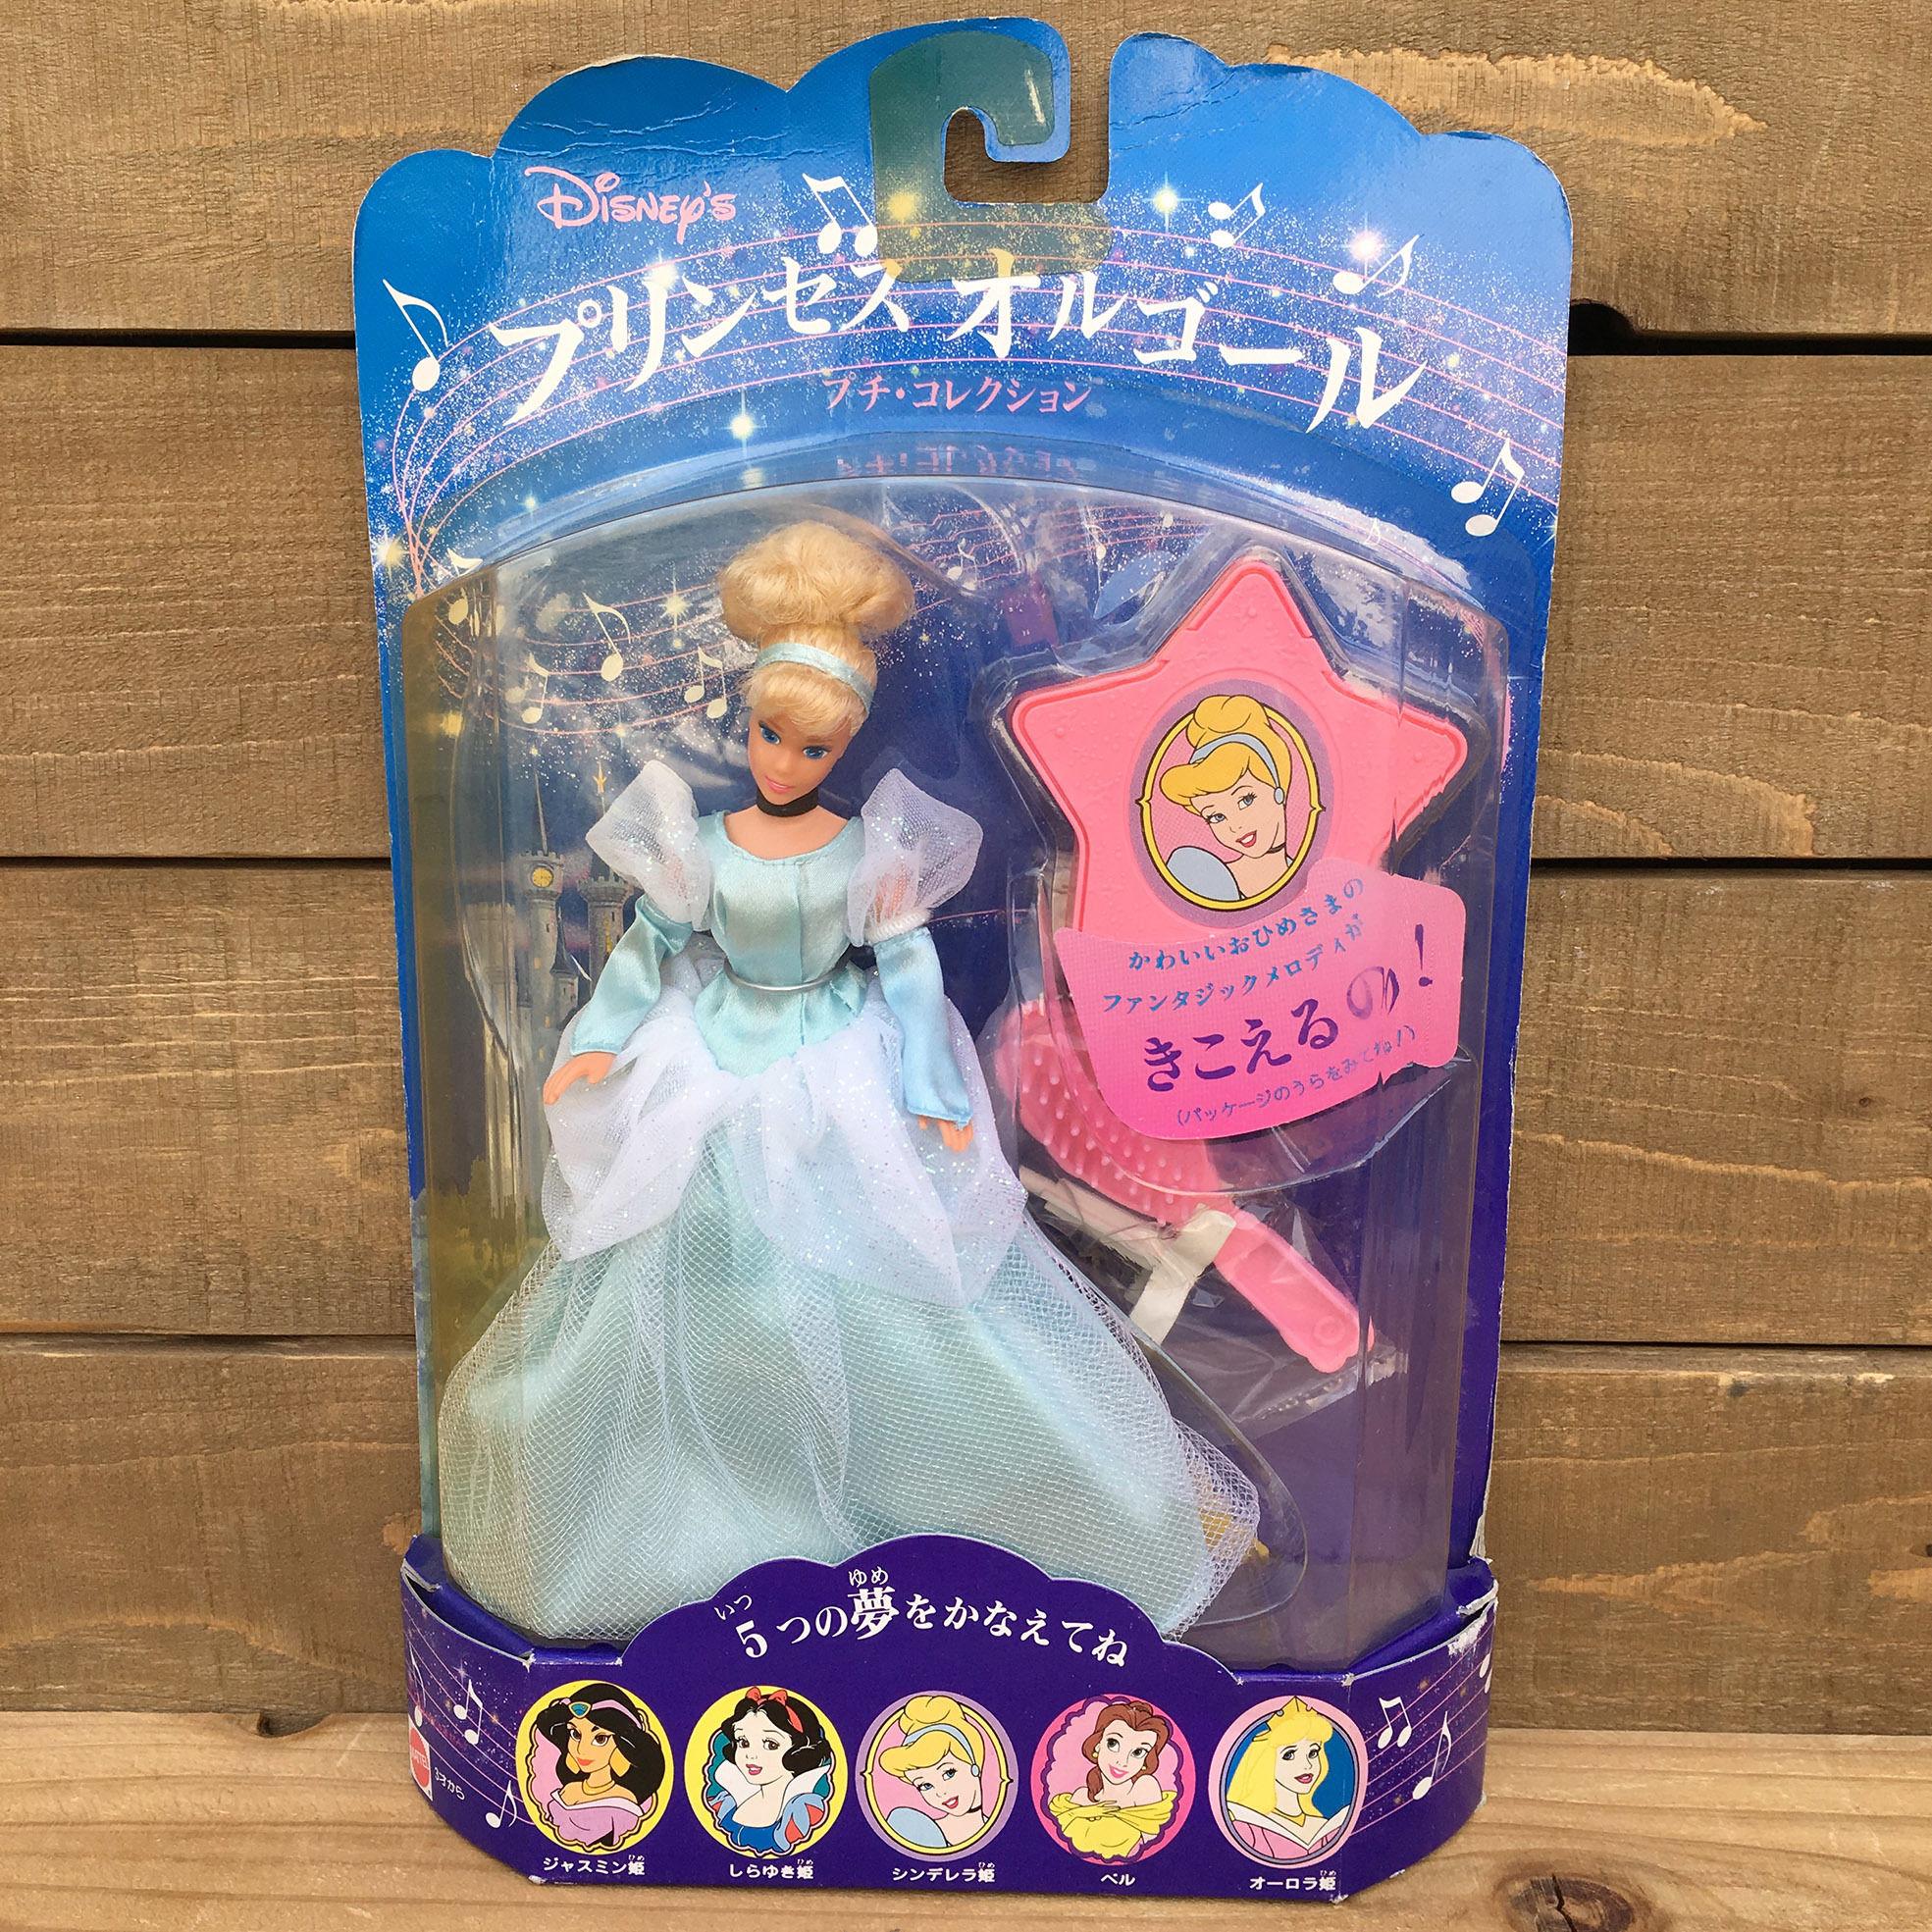 CINDERELLA Princess Music Box Doll Cinderella/シンデレラ プリンセスオルゴールドール シンデレラ/170506-3